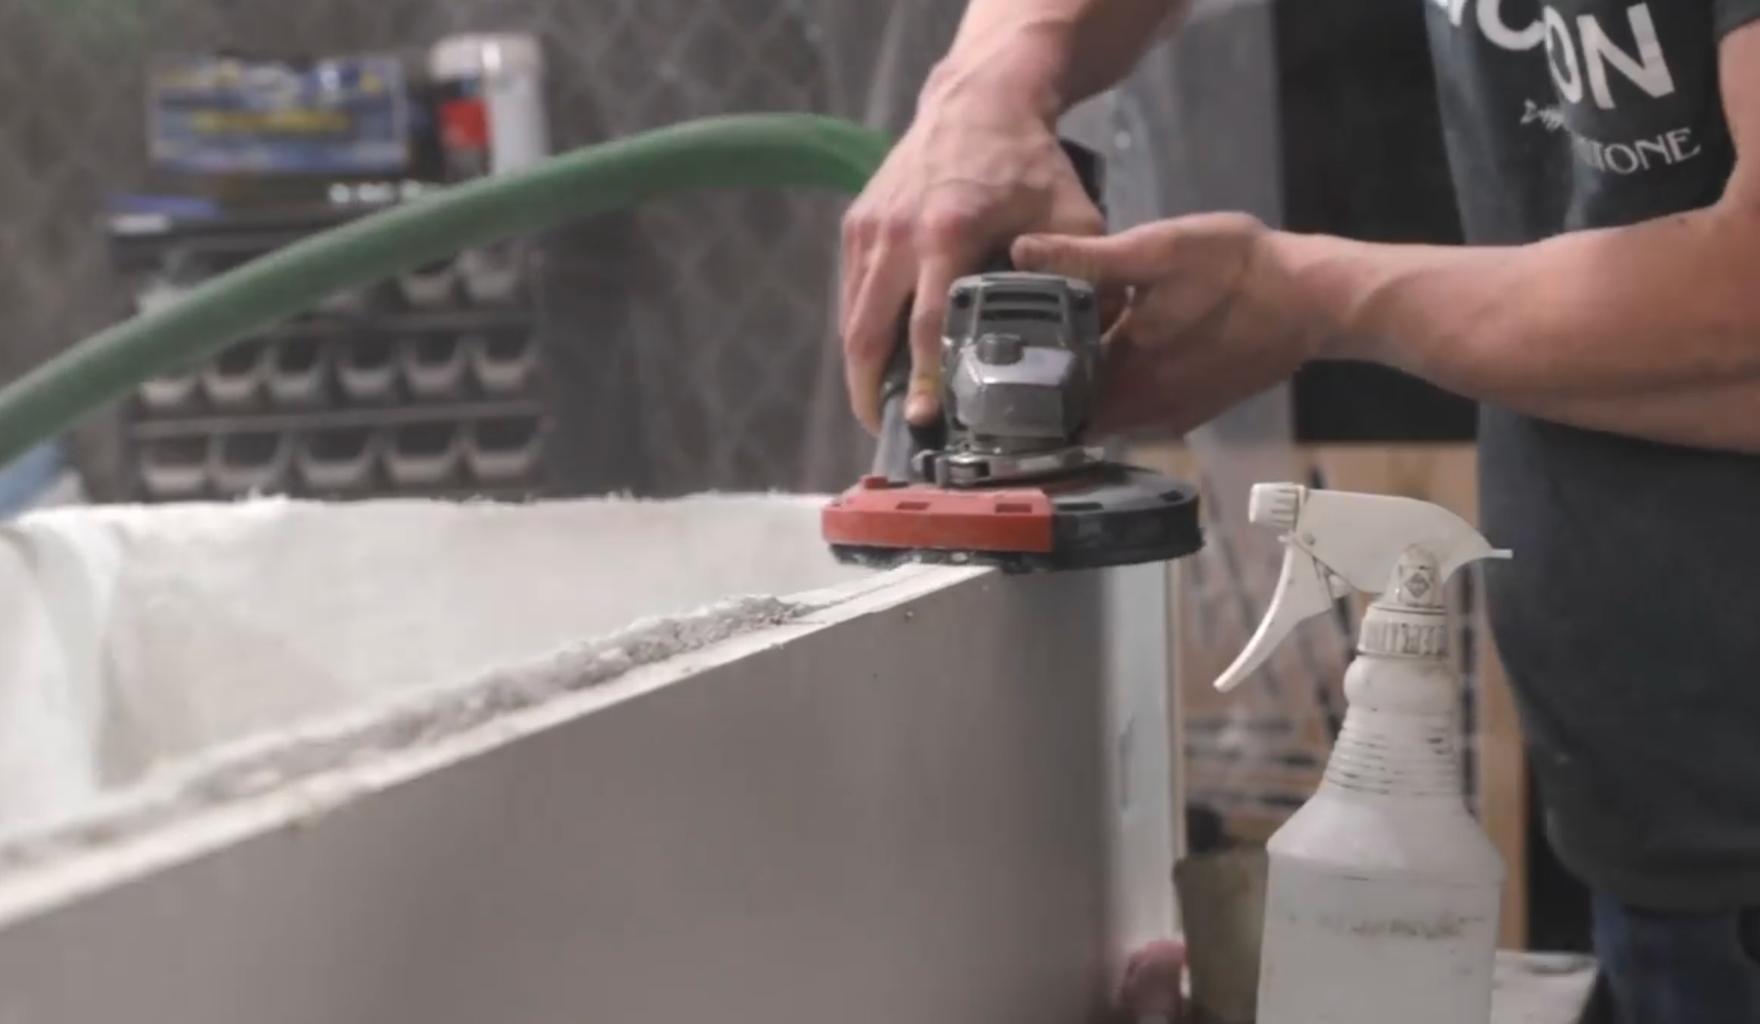 Demolding the Concrete